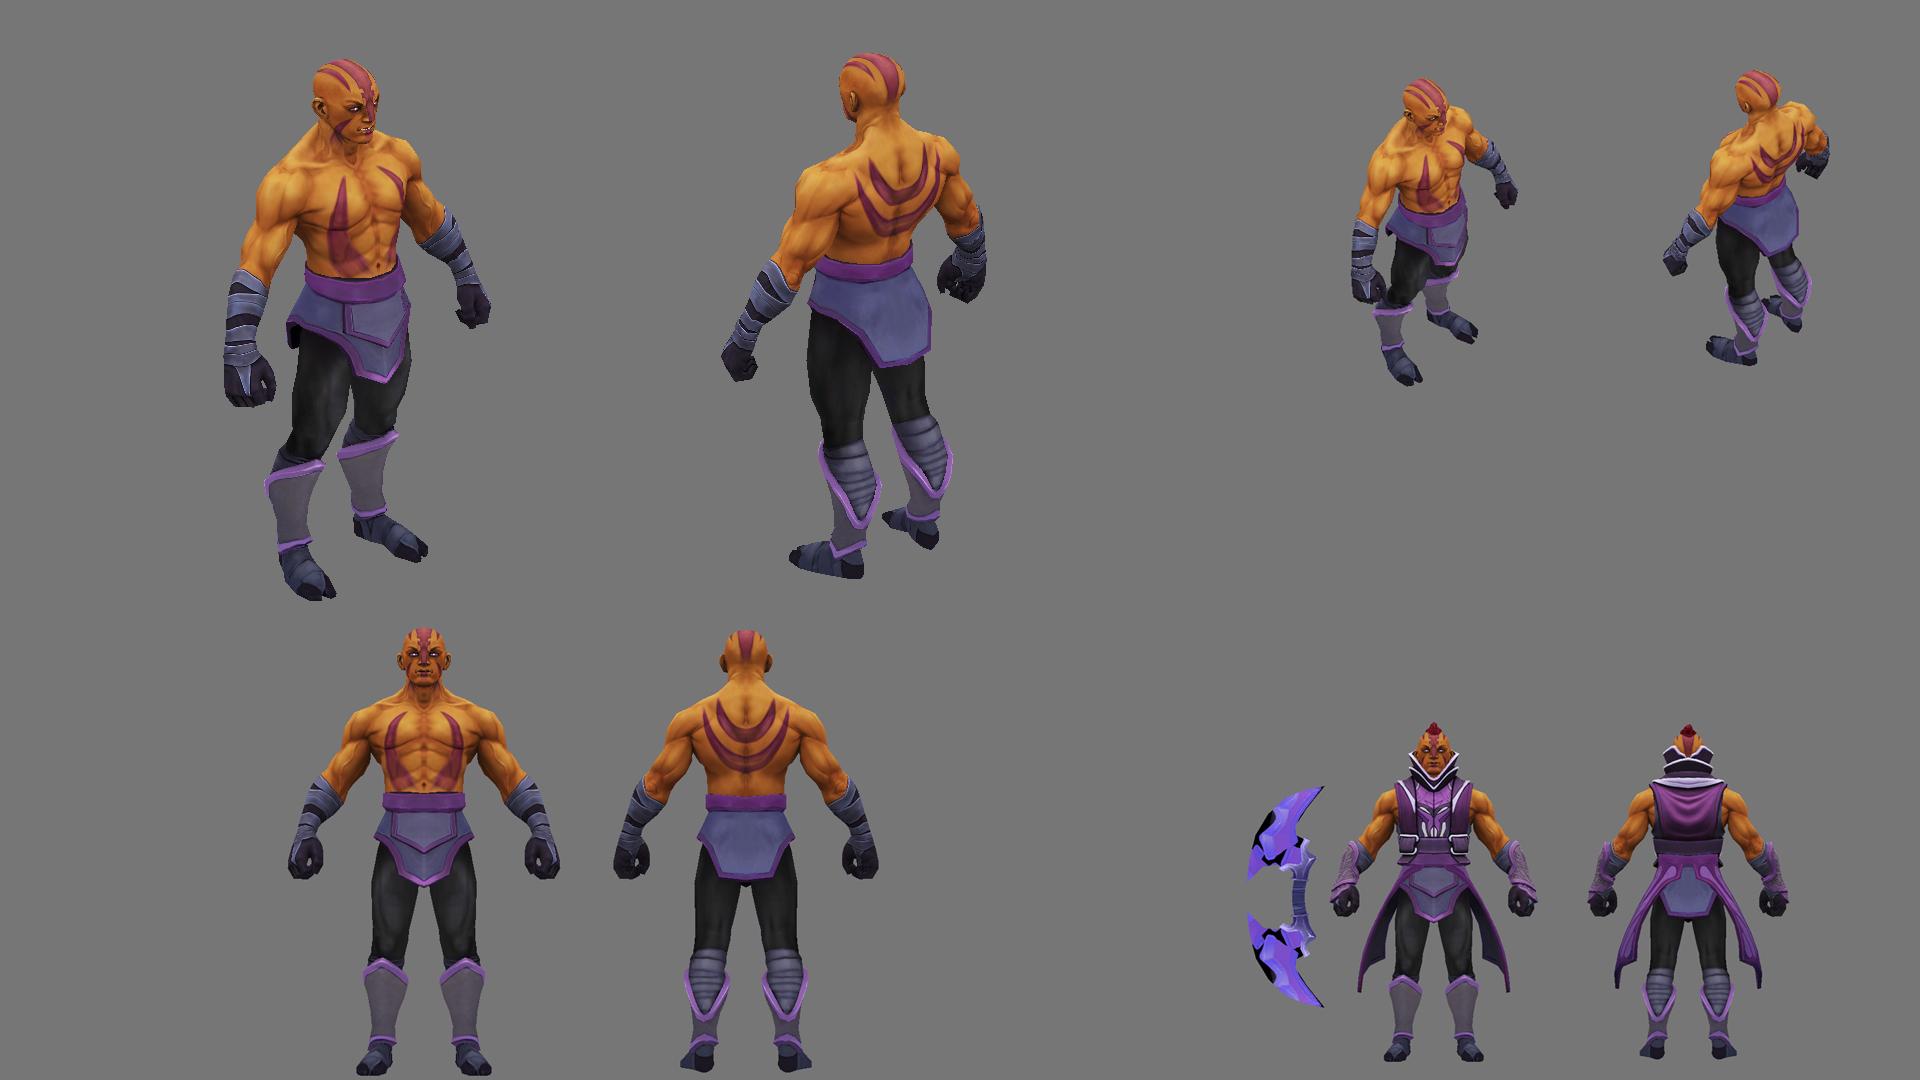 Dota Character Design Pdf : Steam community guide dota hero concept sheets